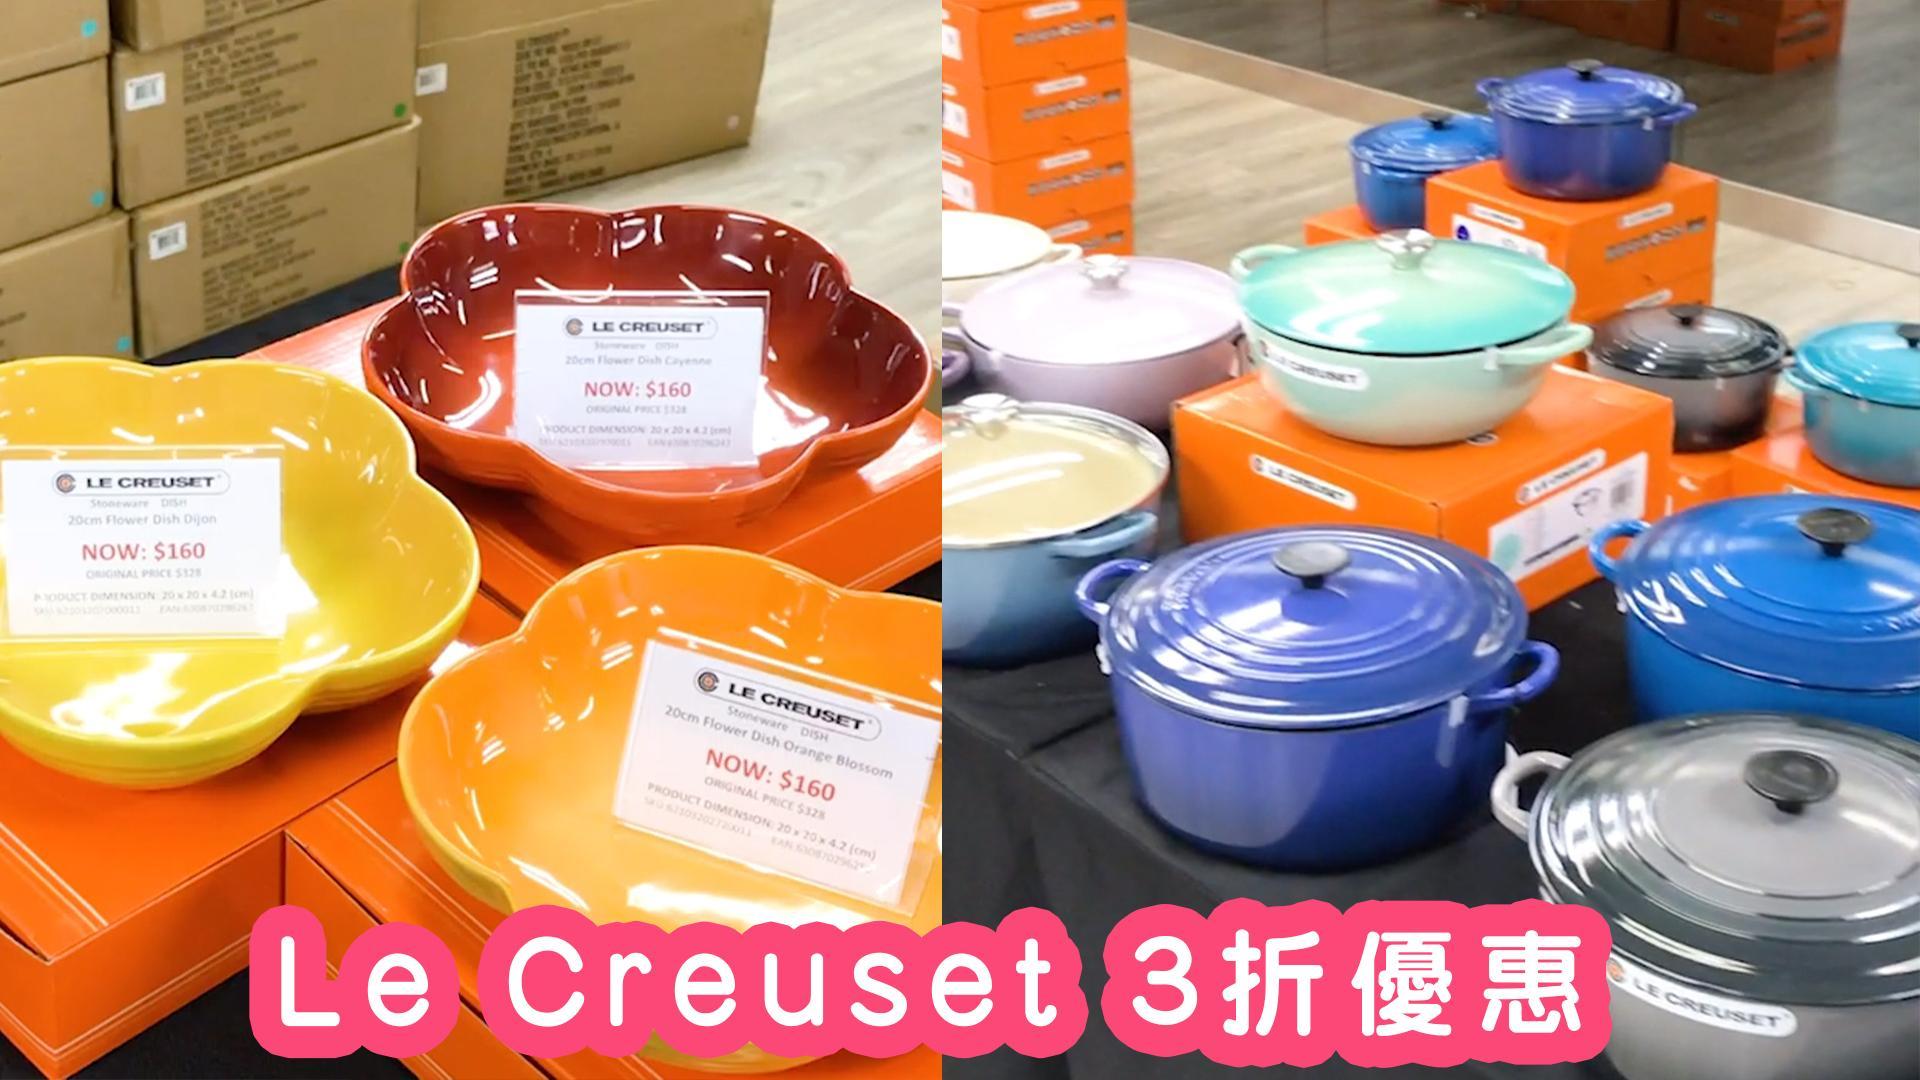 Le Creuset 3折優惠 中環名牌廚具低至$100